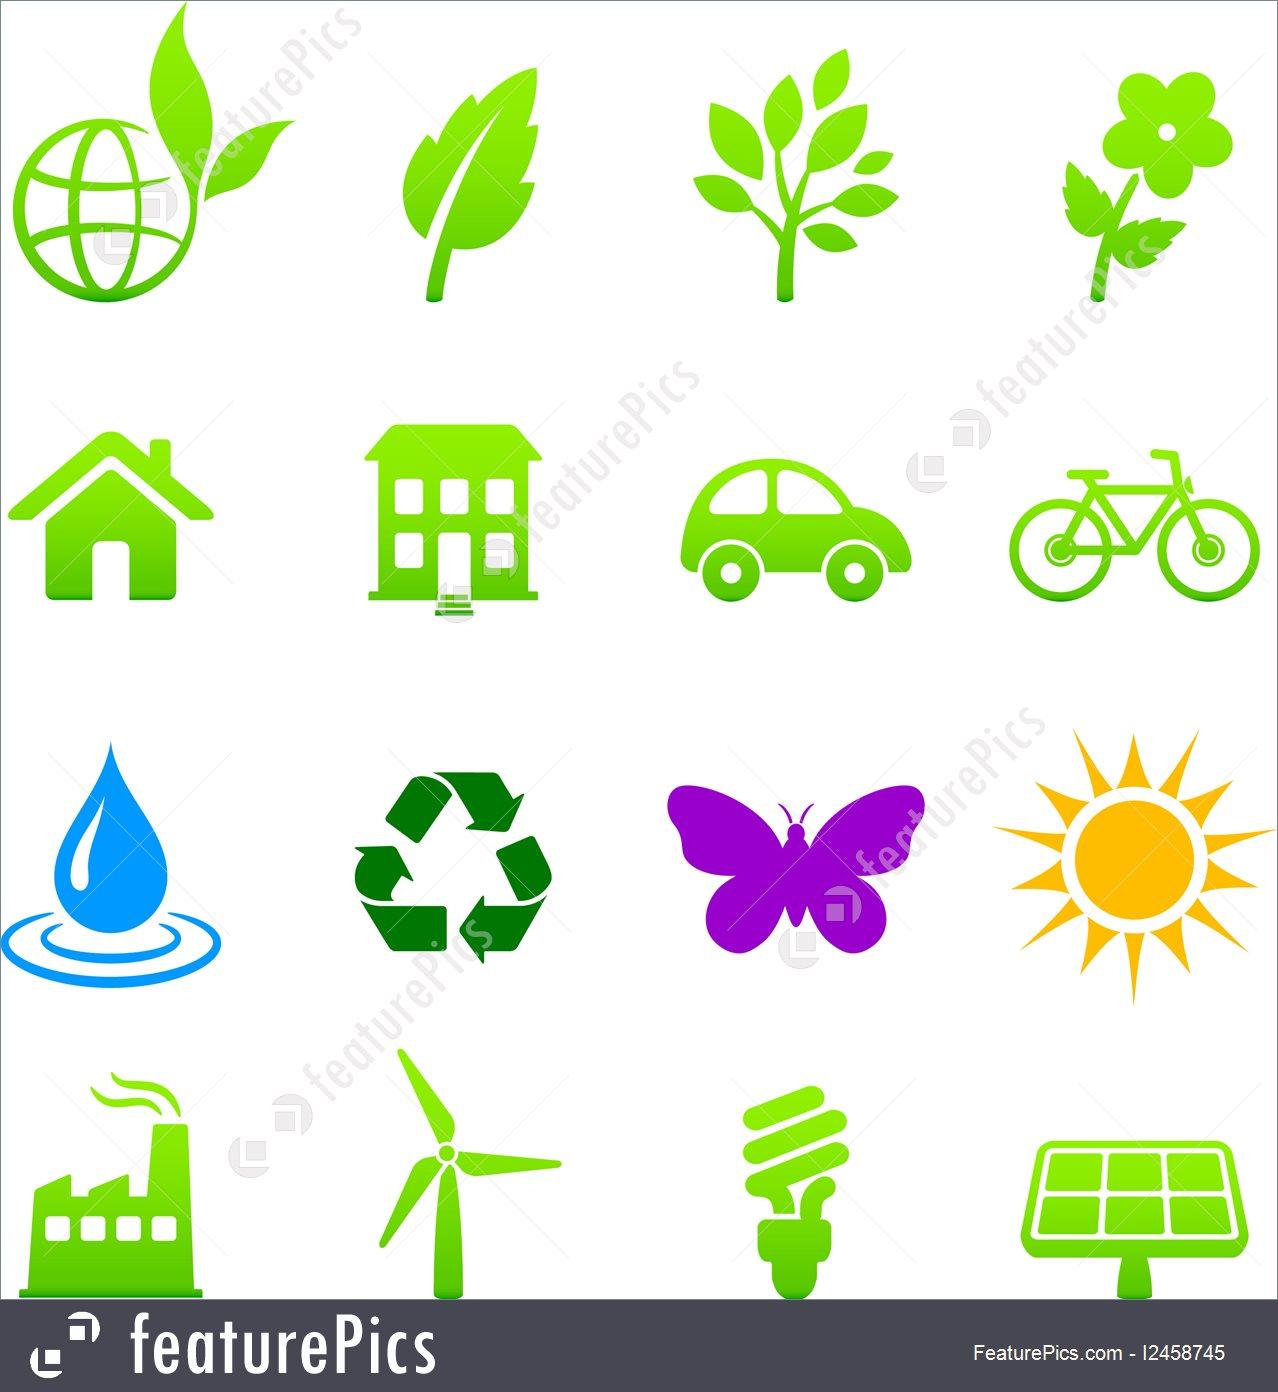 Environment Concept: Environment Elements Icon Set.